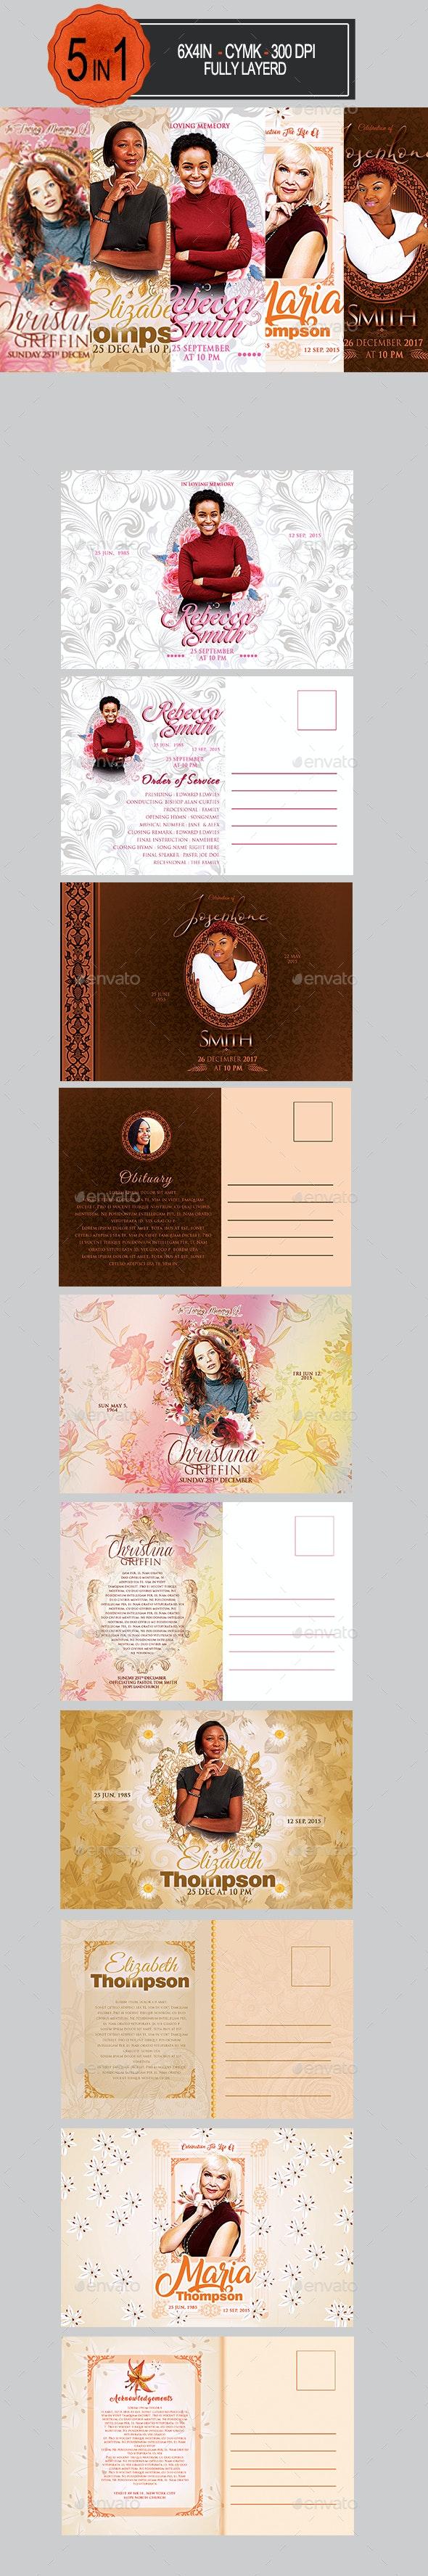 Funeral Postcard Bundle - Invitations Cards & Invites